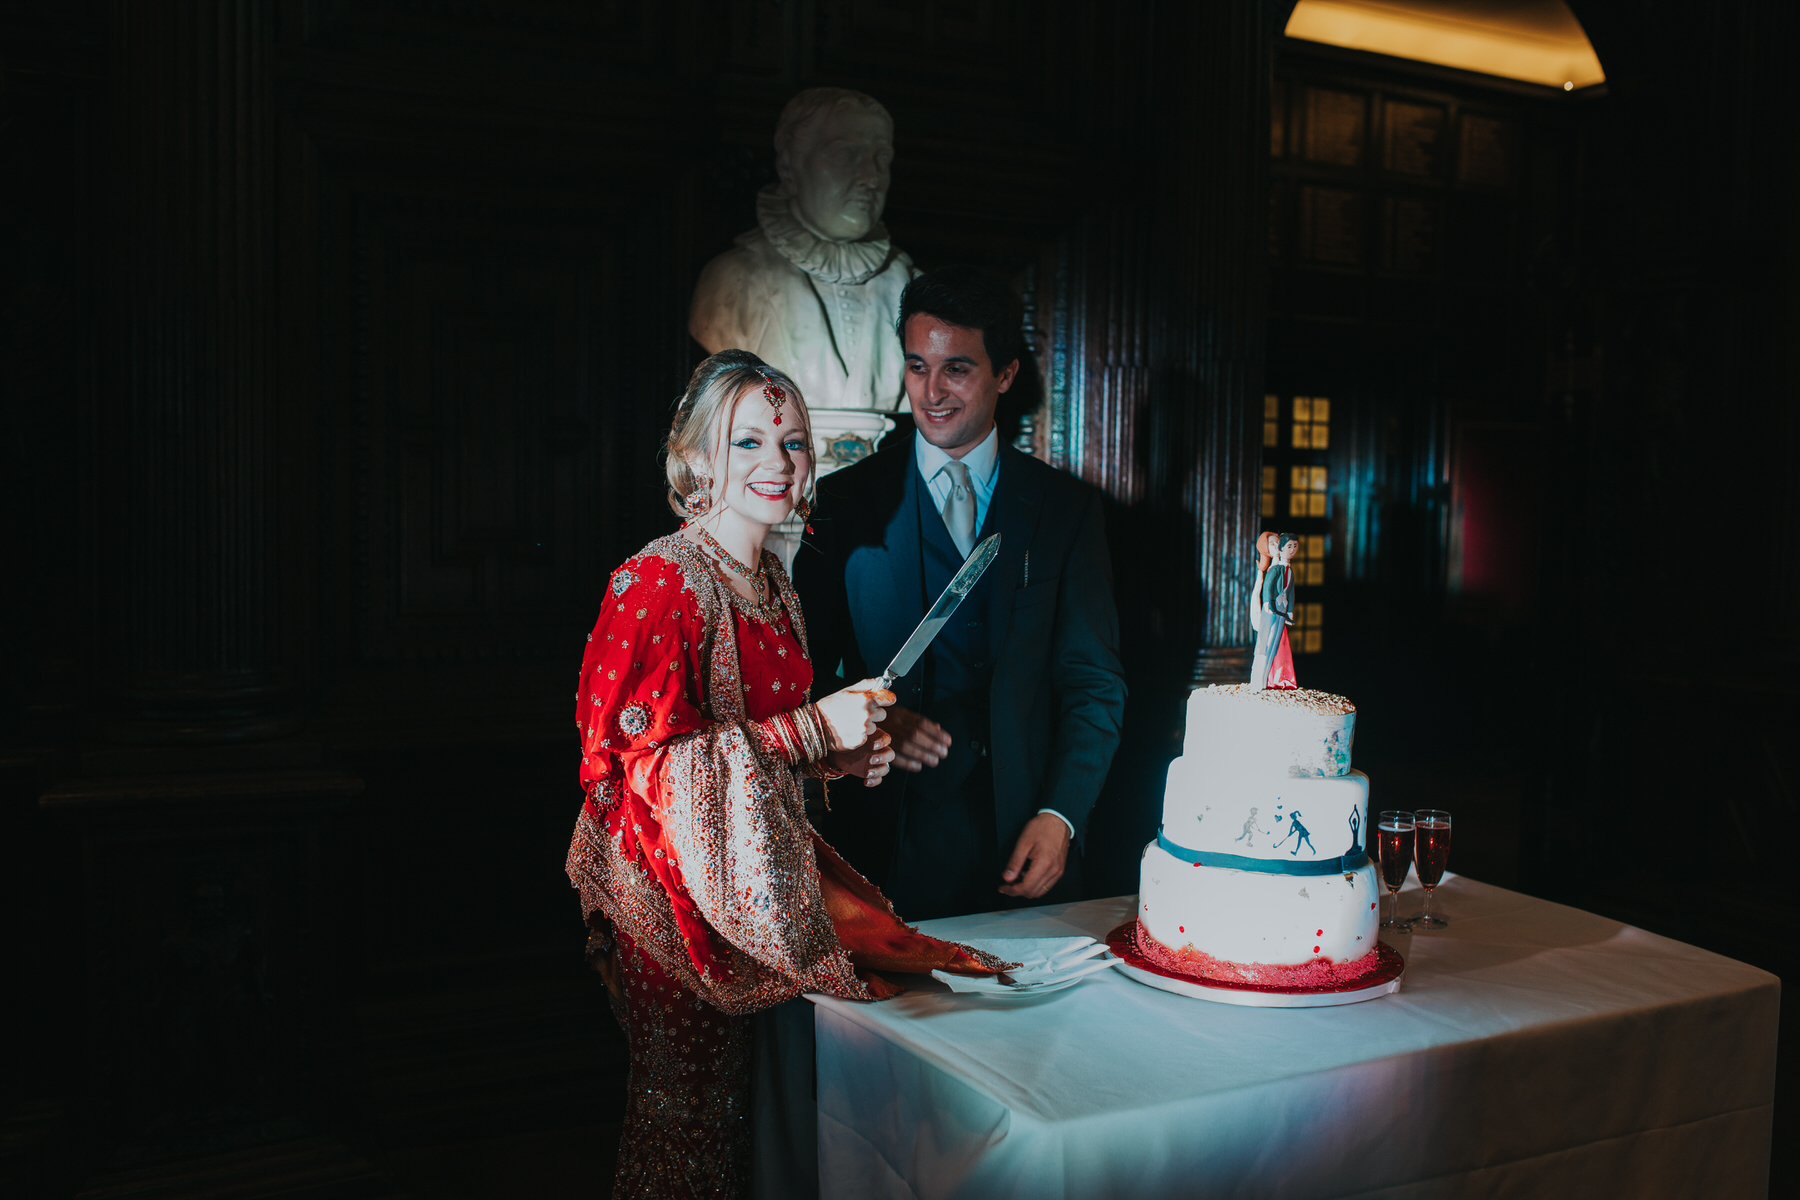 210-cutting-cake-Anglo-Asian-wedding.jpg